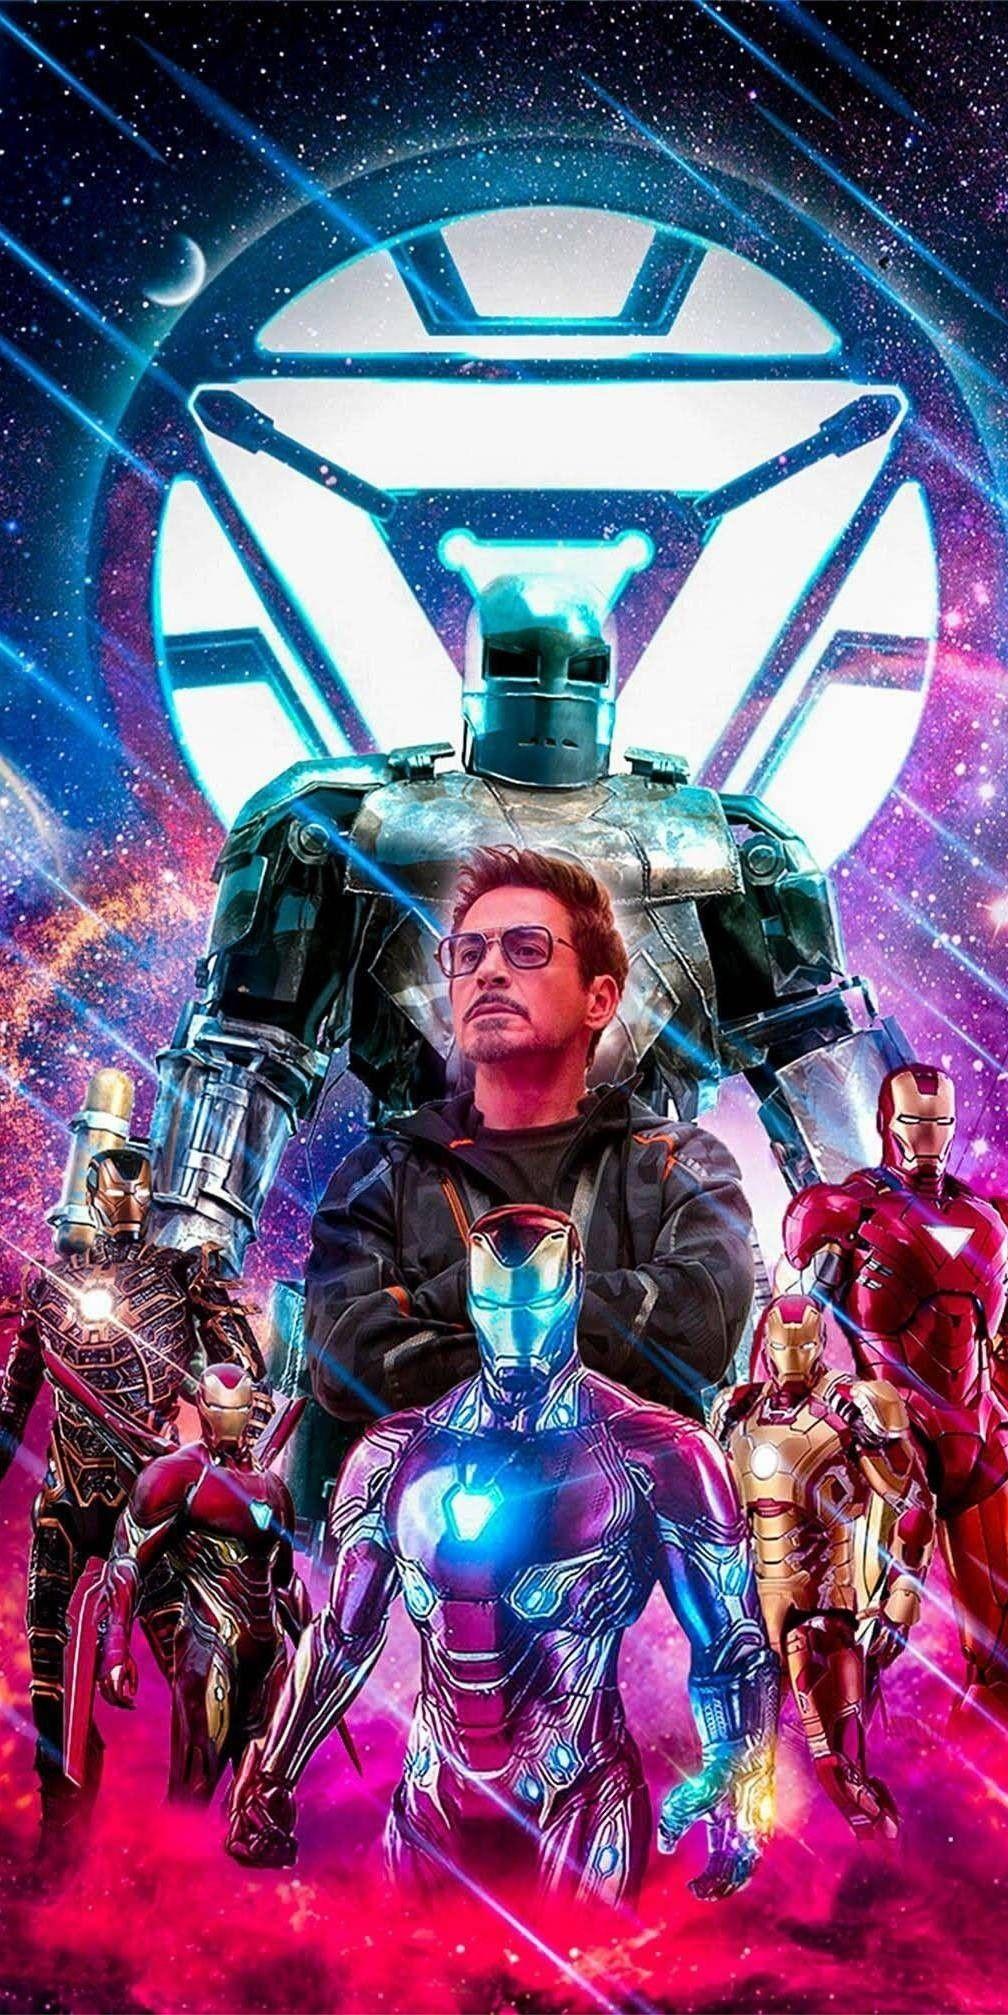 Pin by ️ ᑕᕼIᒪᒪ ️ on marvel in 2020 Marvel comics